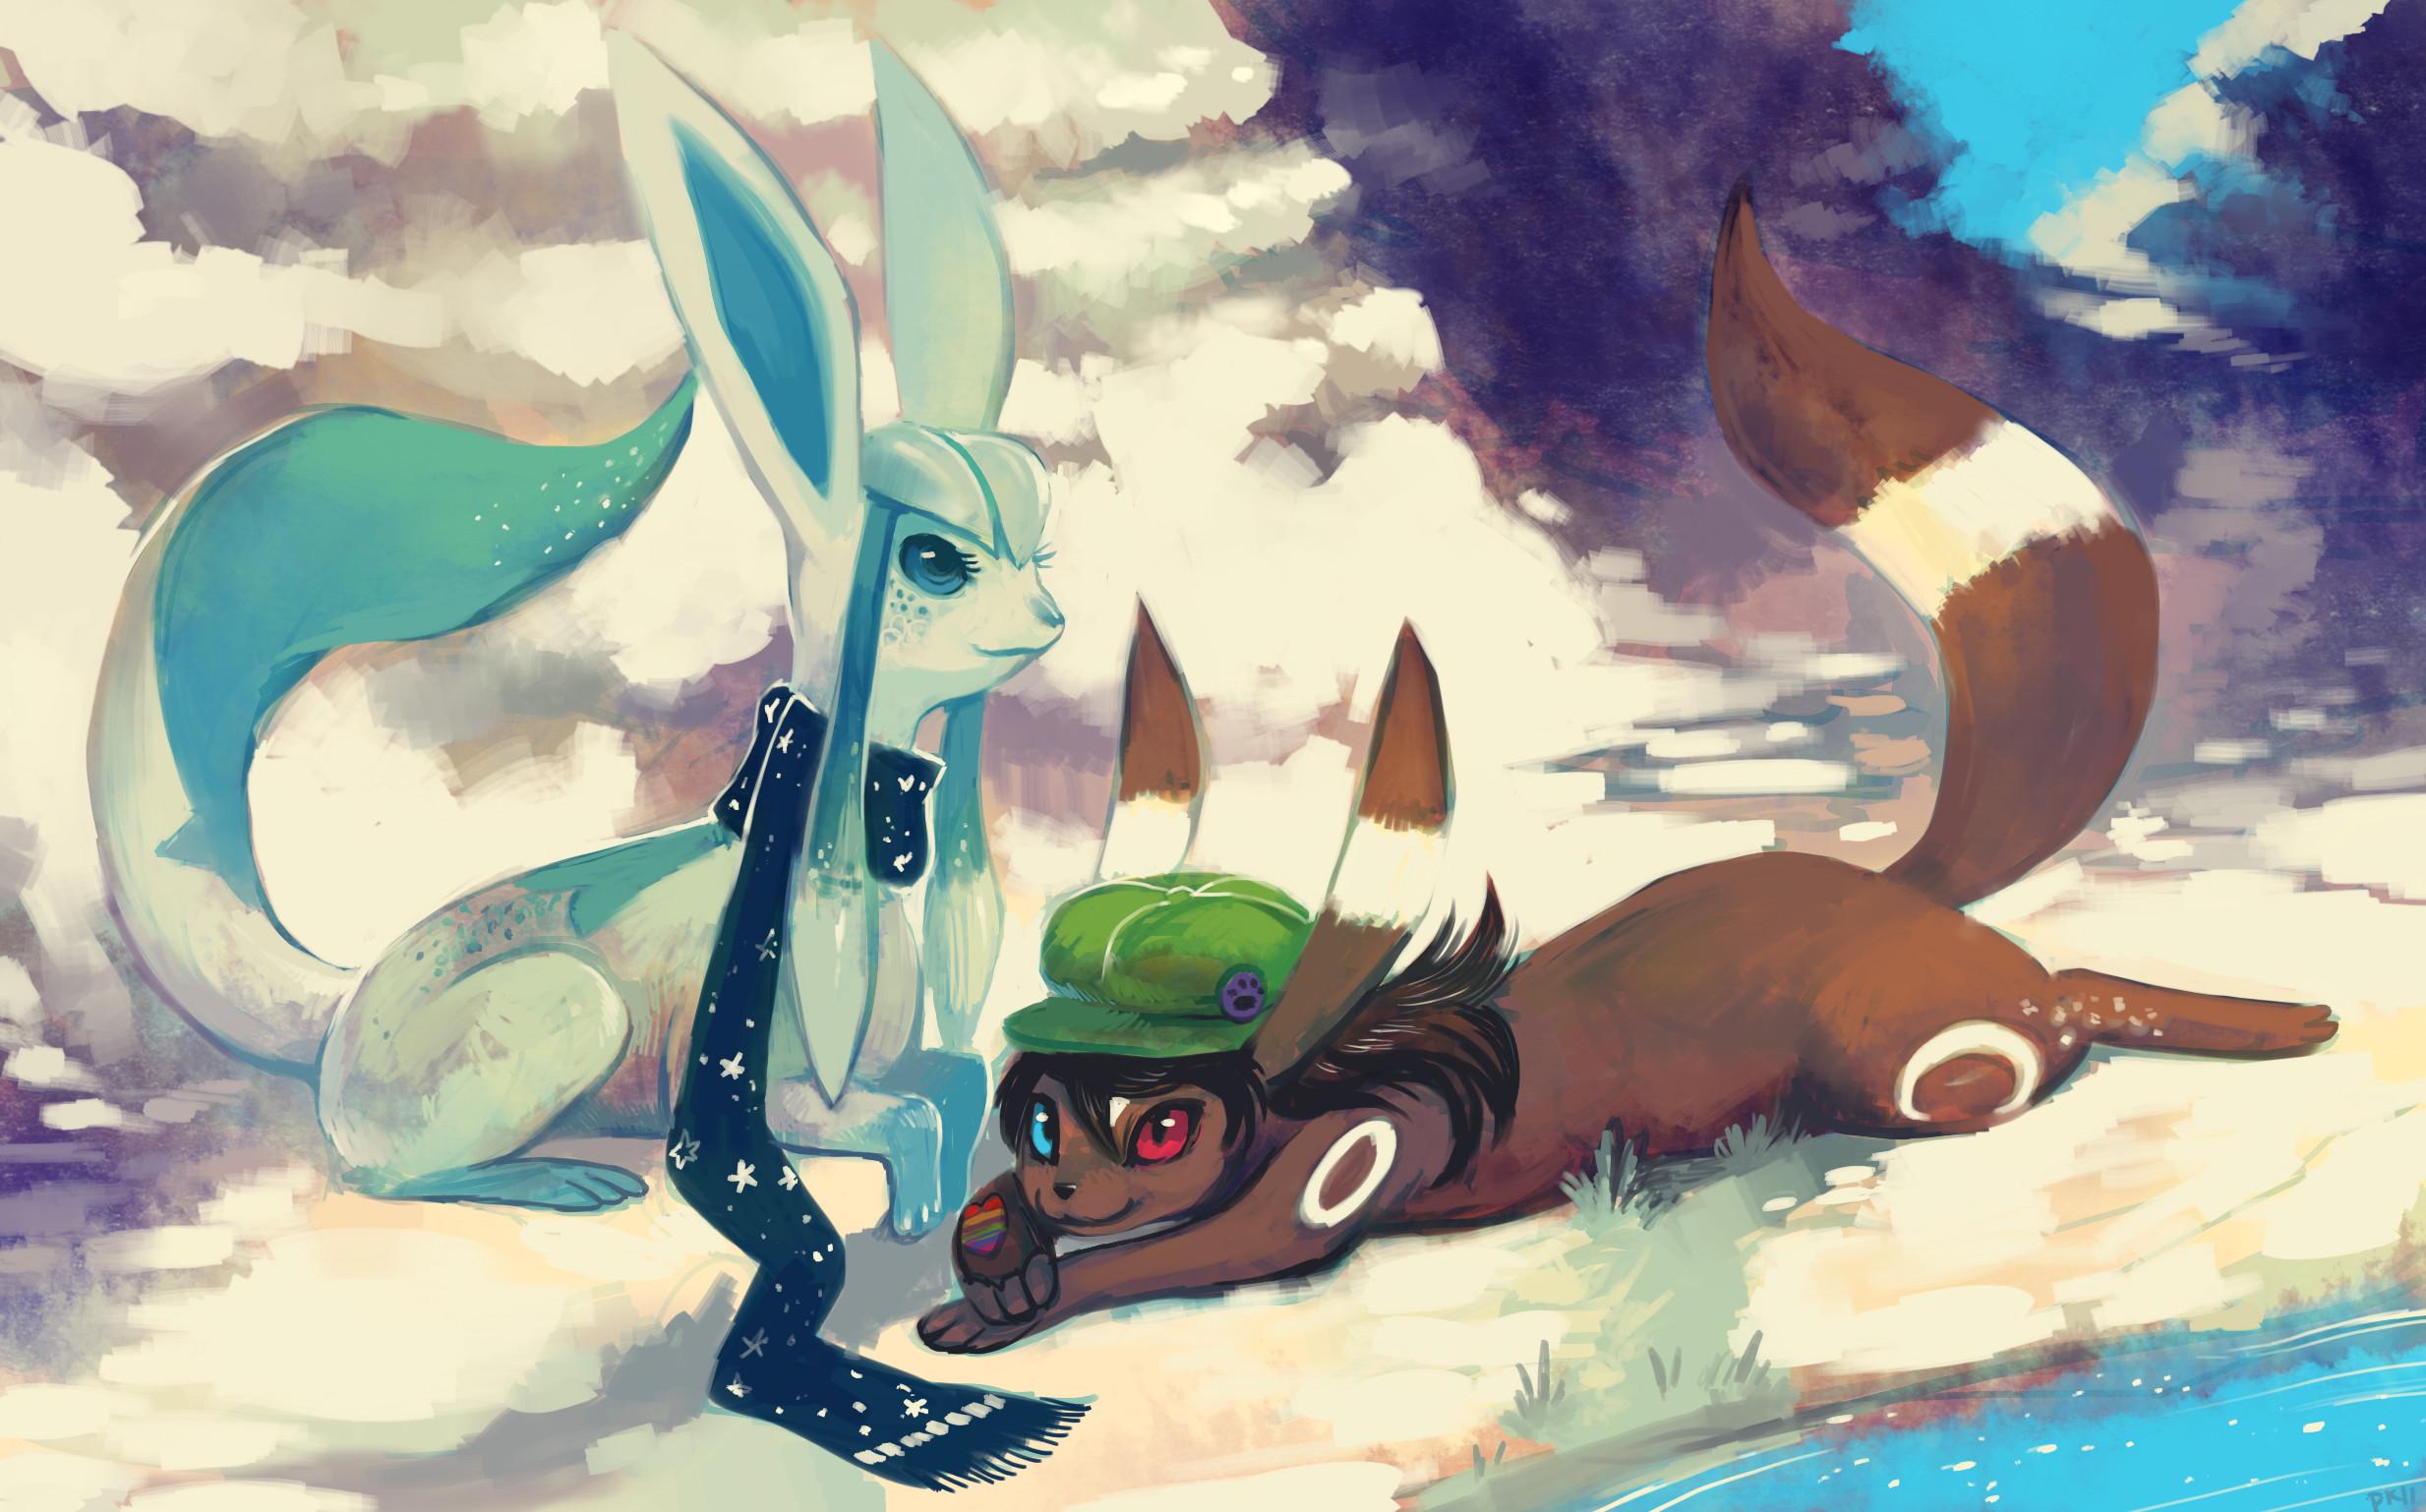 Pokémon · download Pokémon image